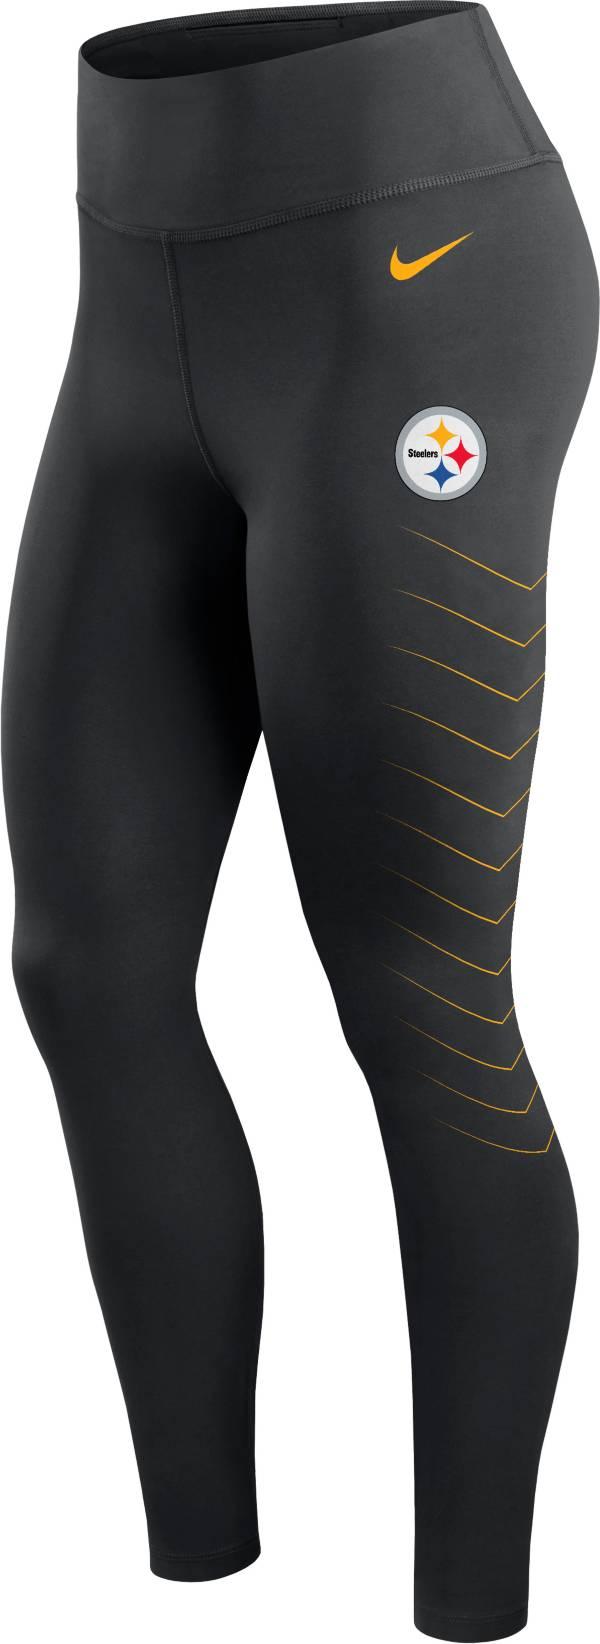 Nike Women's Pittsburgh Steelers Dri-FIT Black Performance Leggings product image